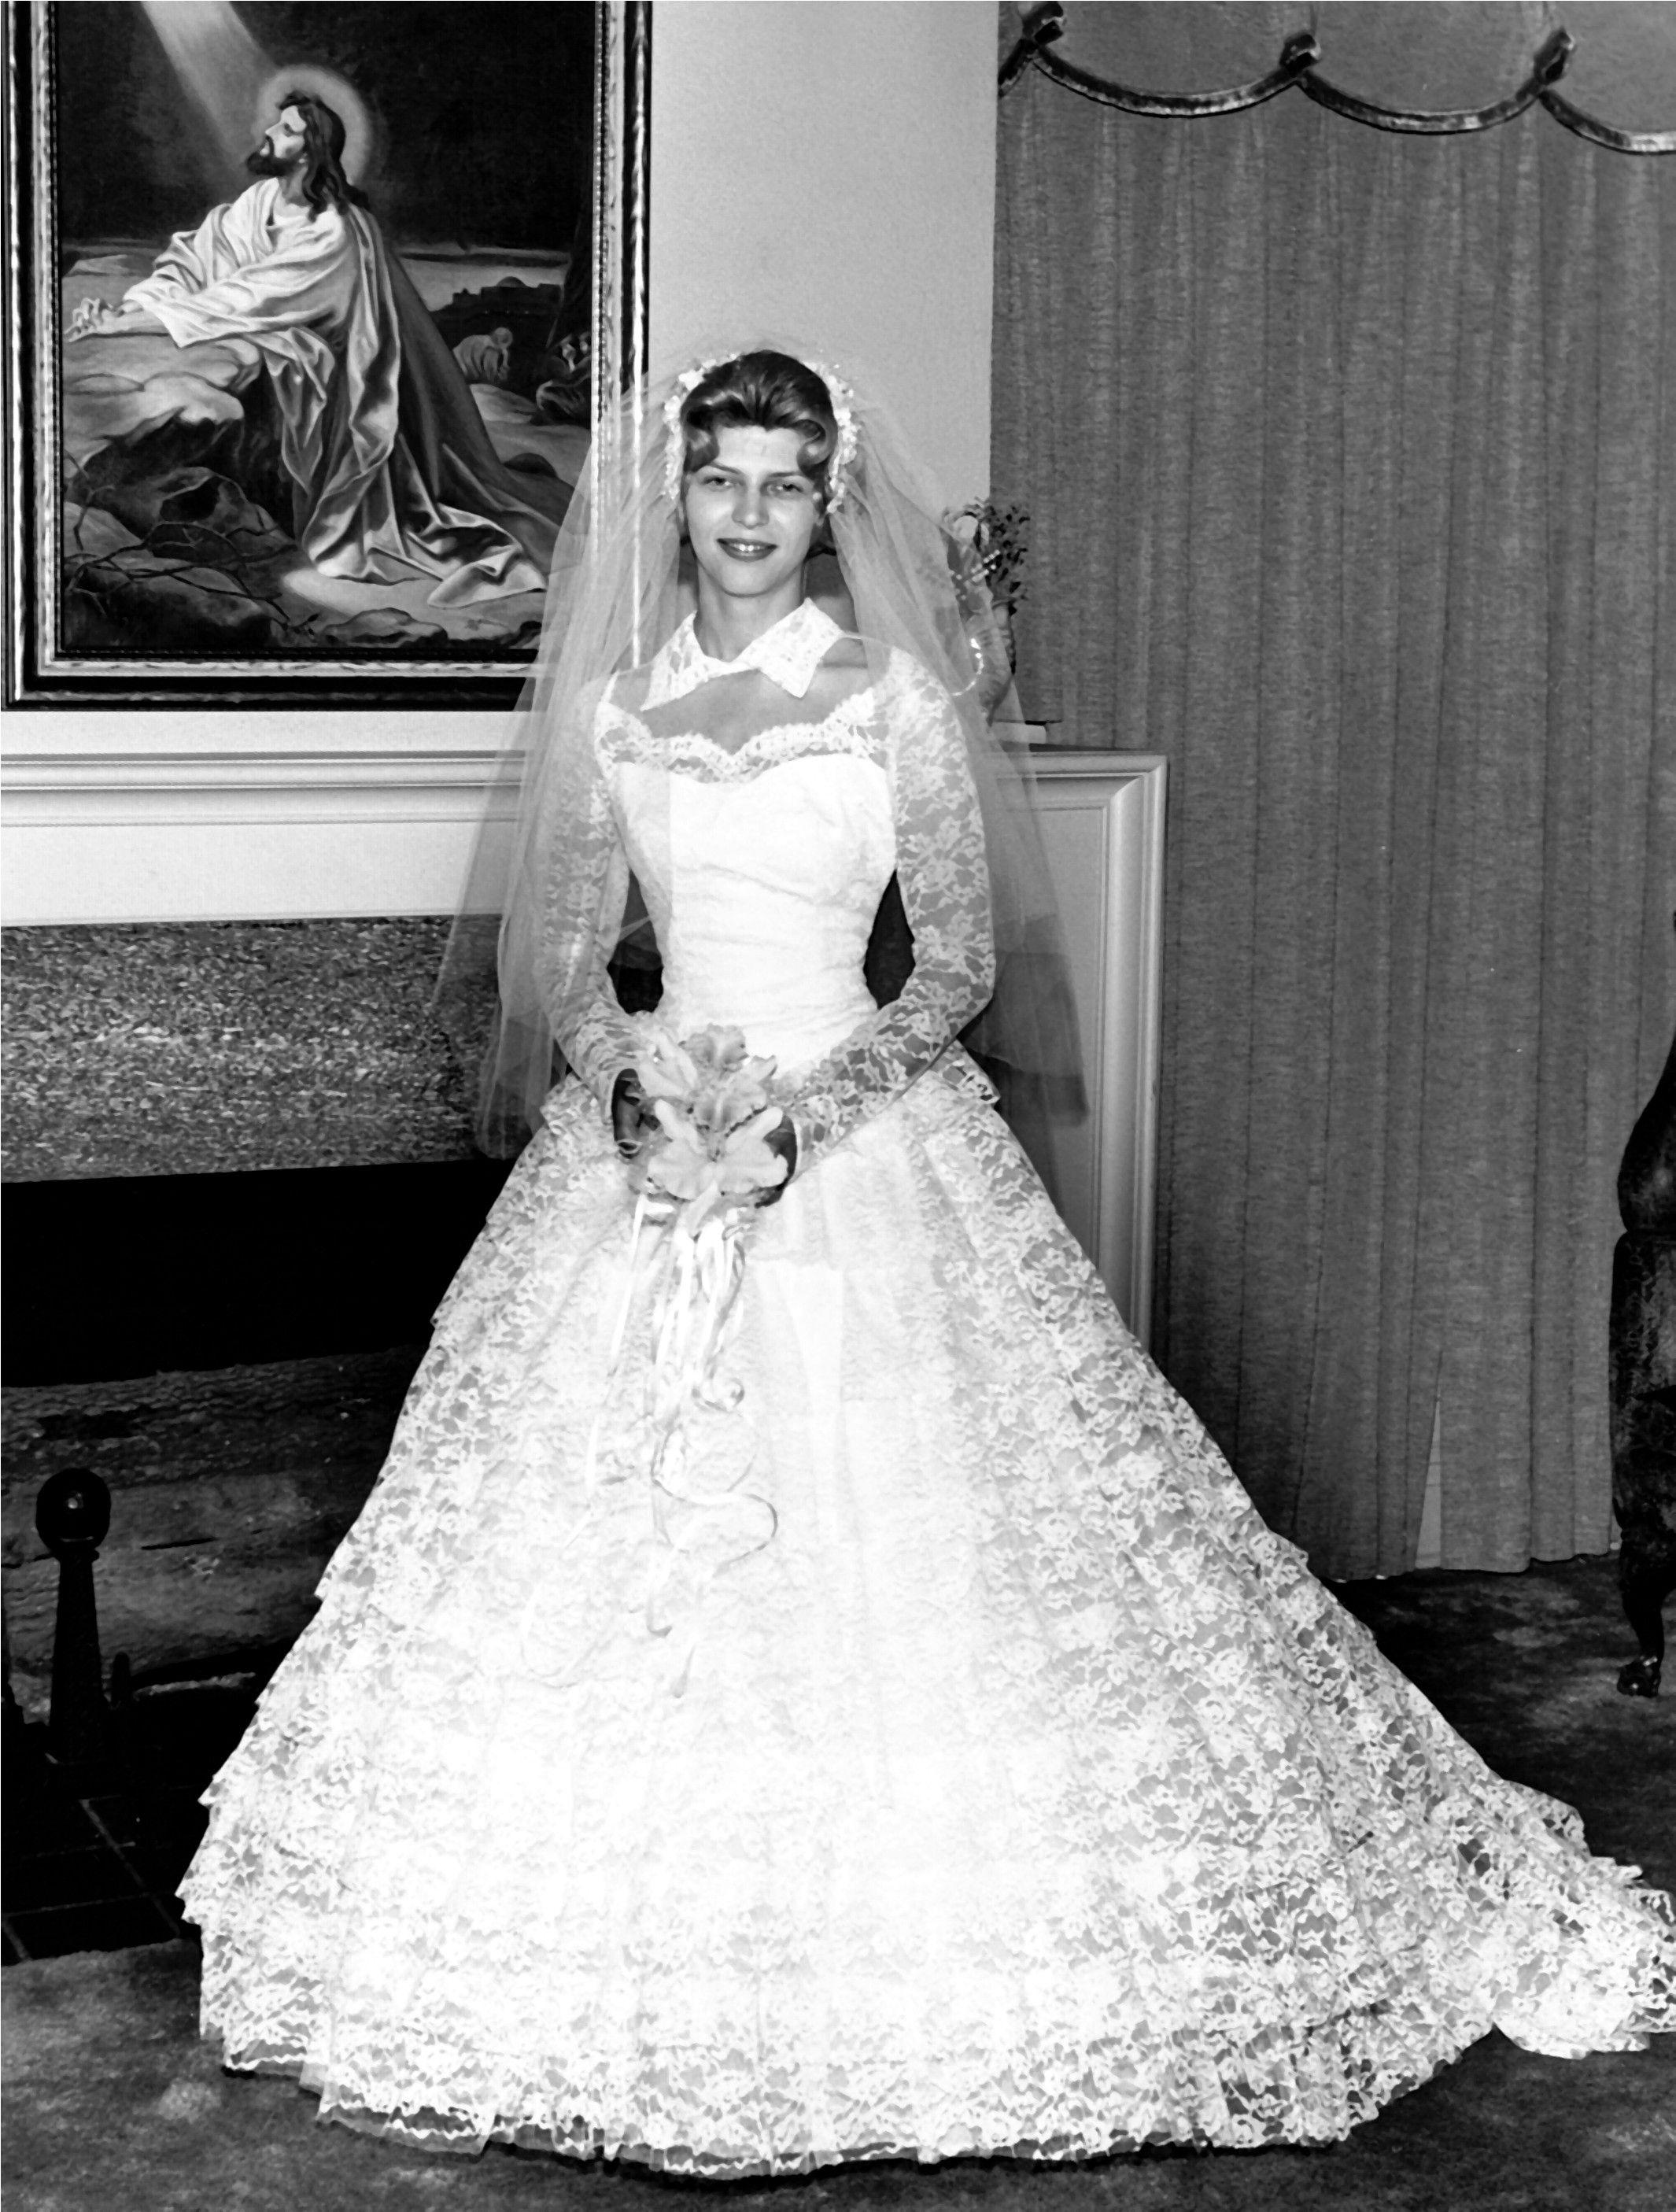 us wedding dress  us Looks  Pinterest  Wedding Wedding